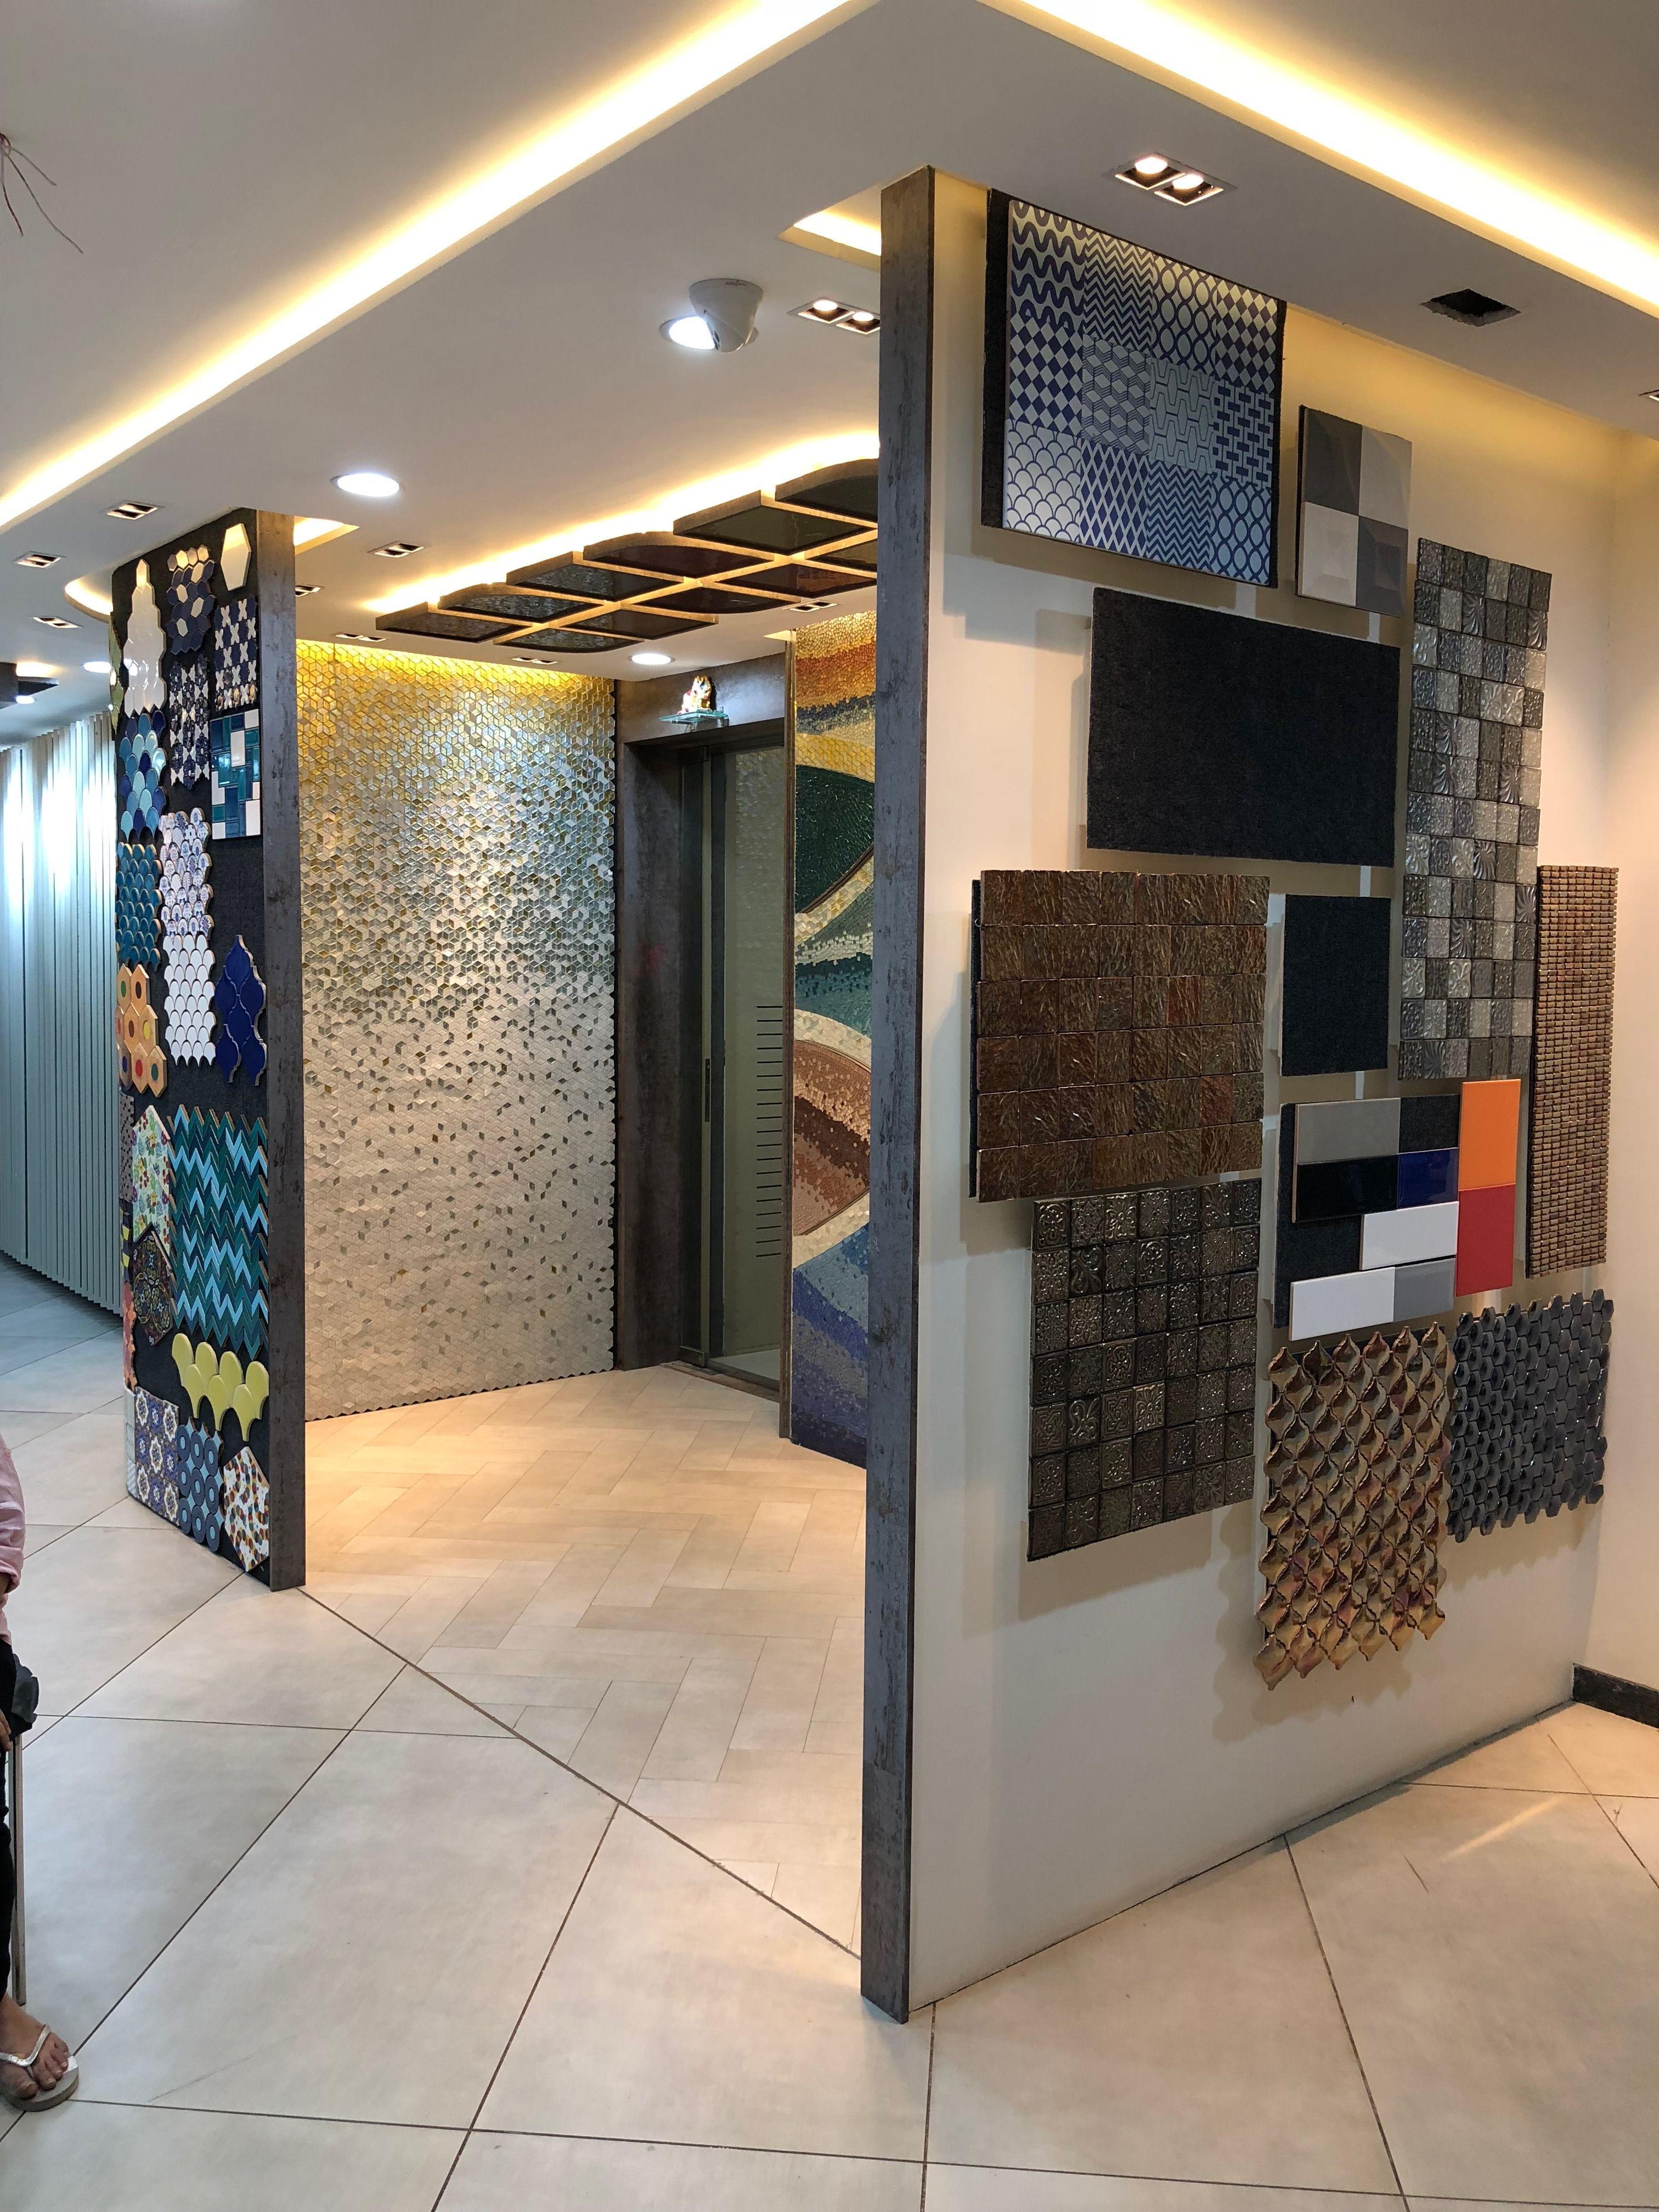 Living Room Interior Design Pdf: Mosaics#display#showroom#curvedwall#entrance#ambience